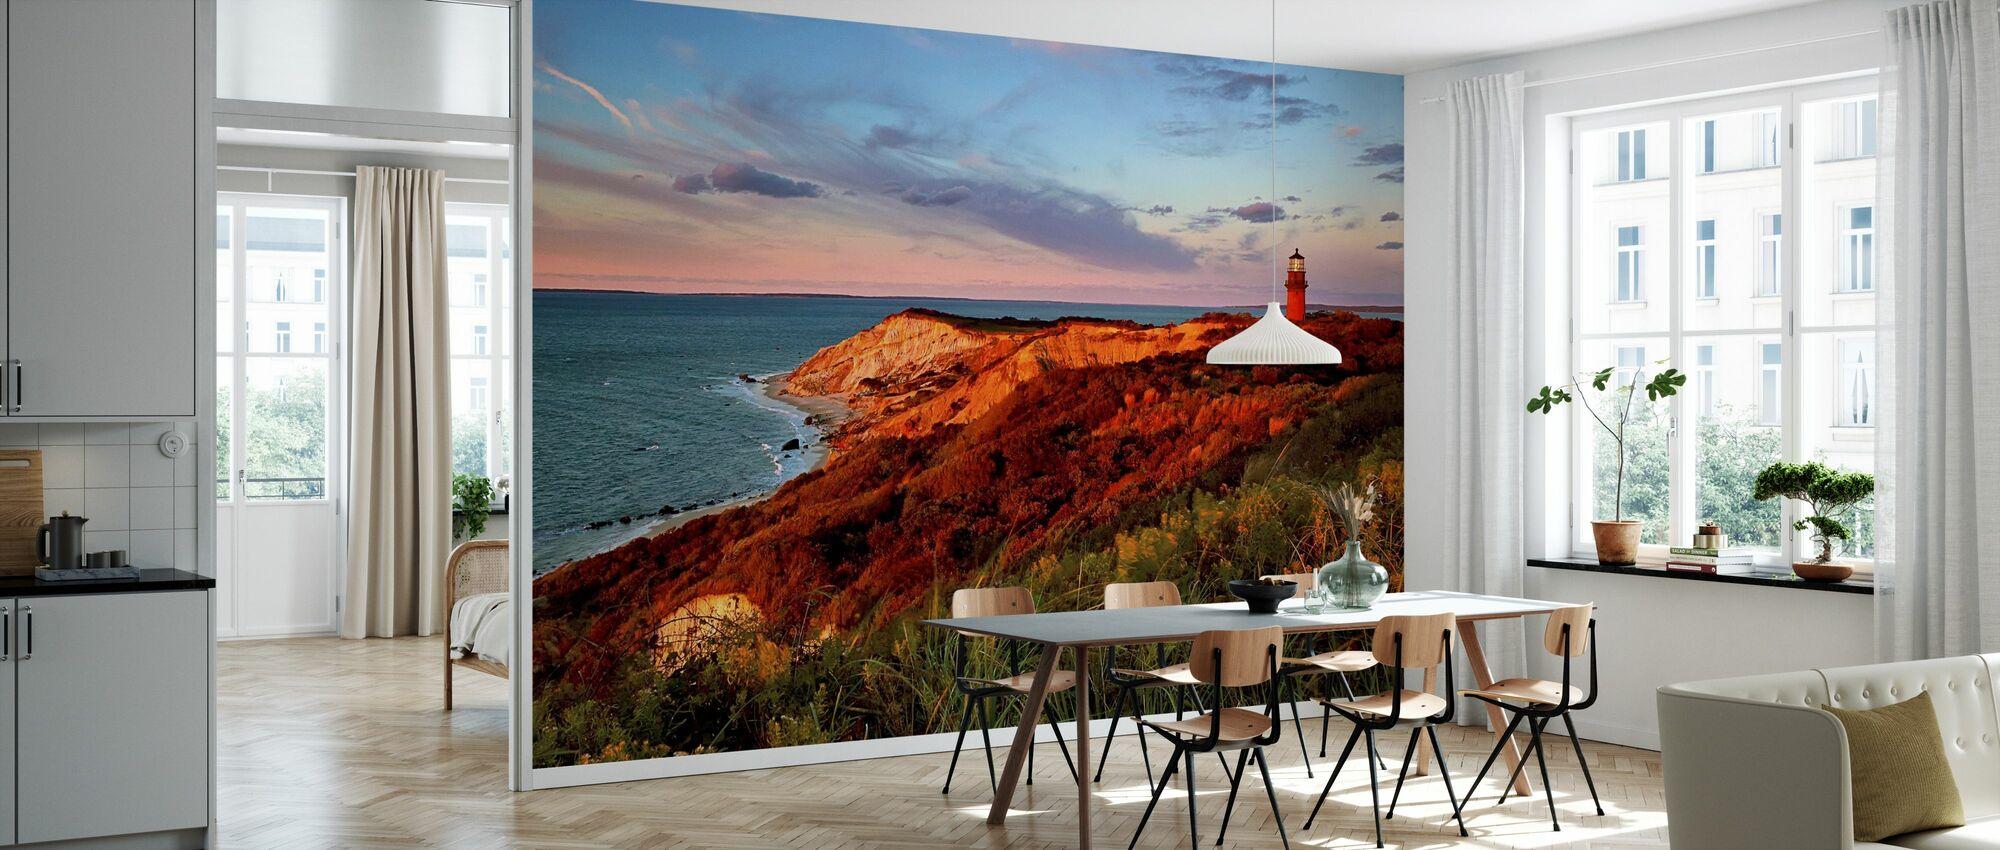 Gay Head Sunset - Wallpaper - Kitchen